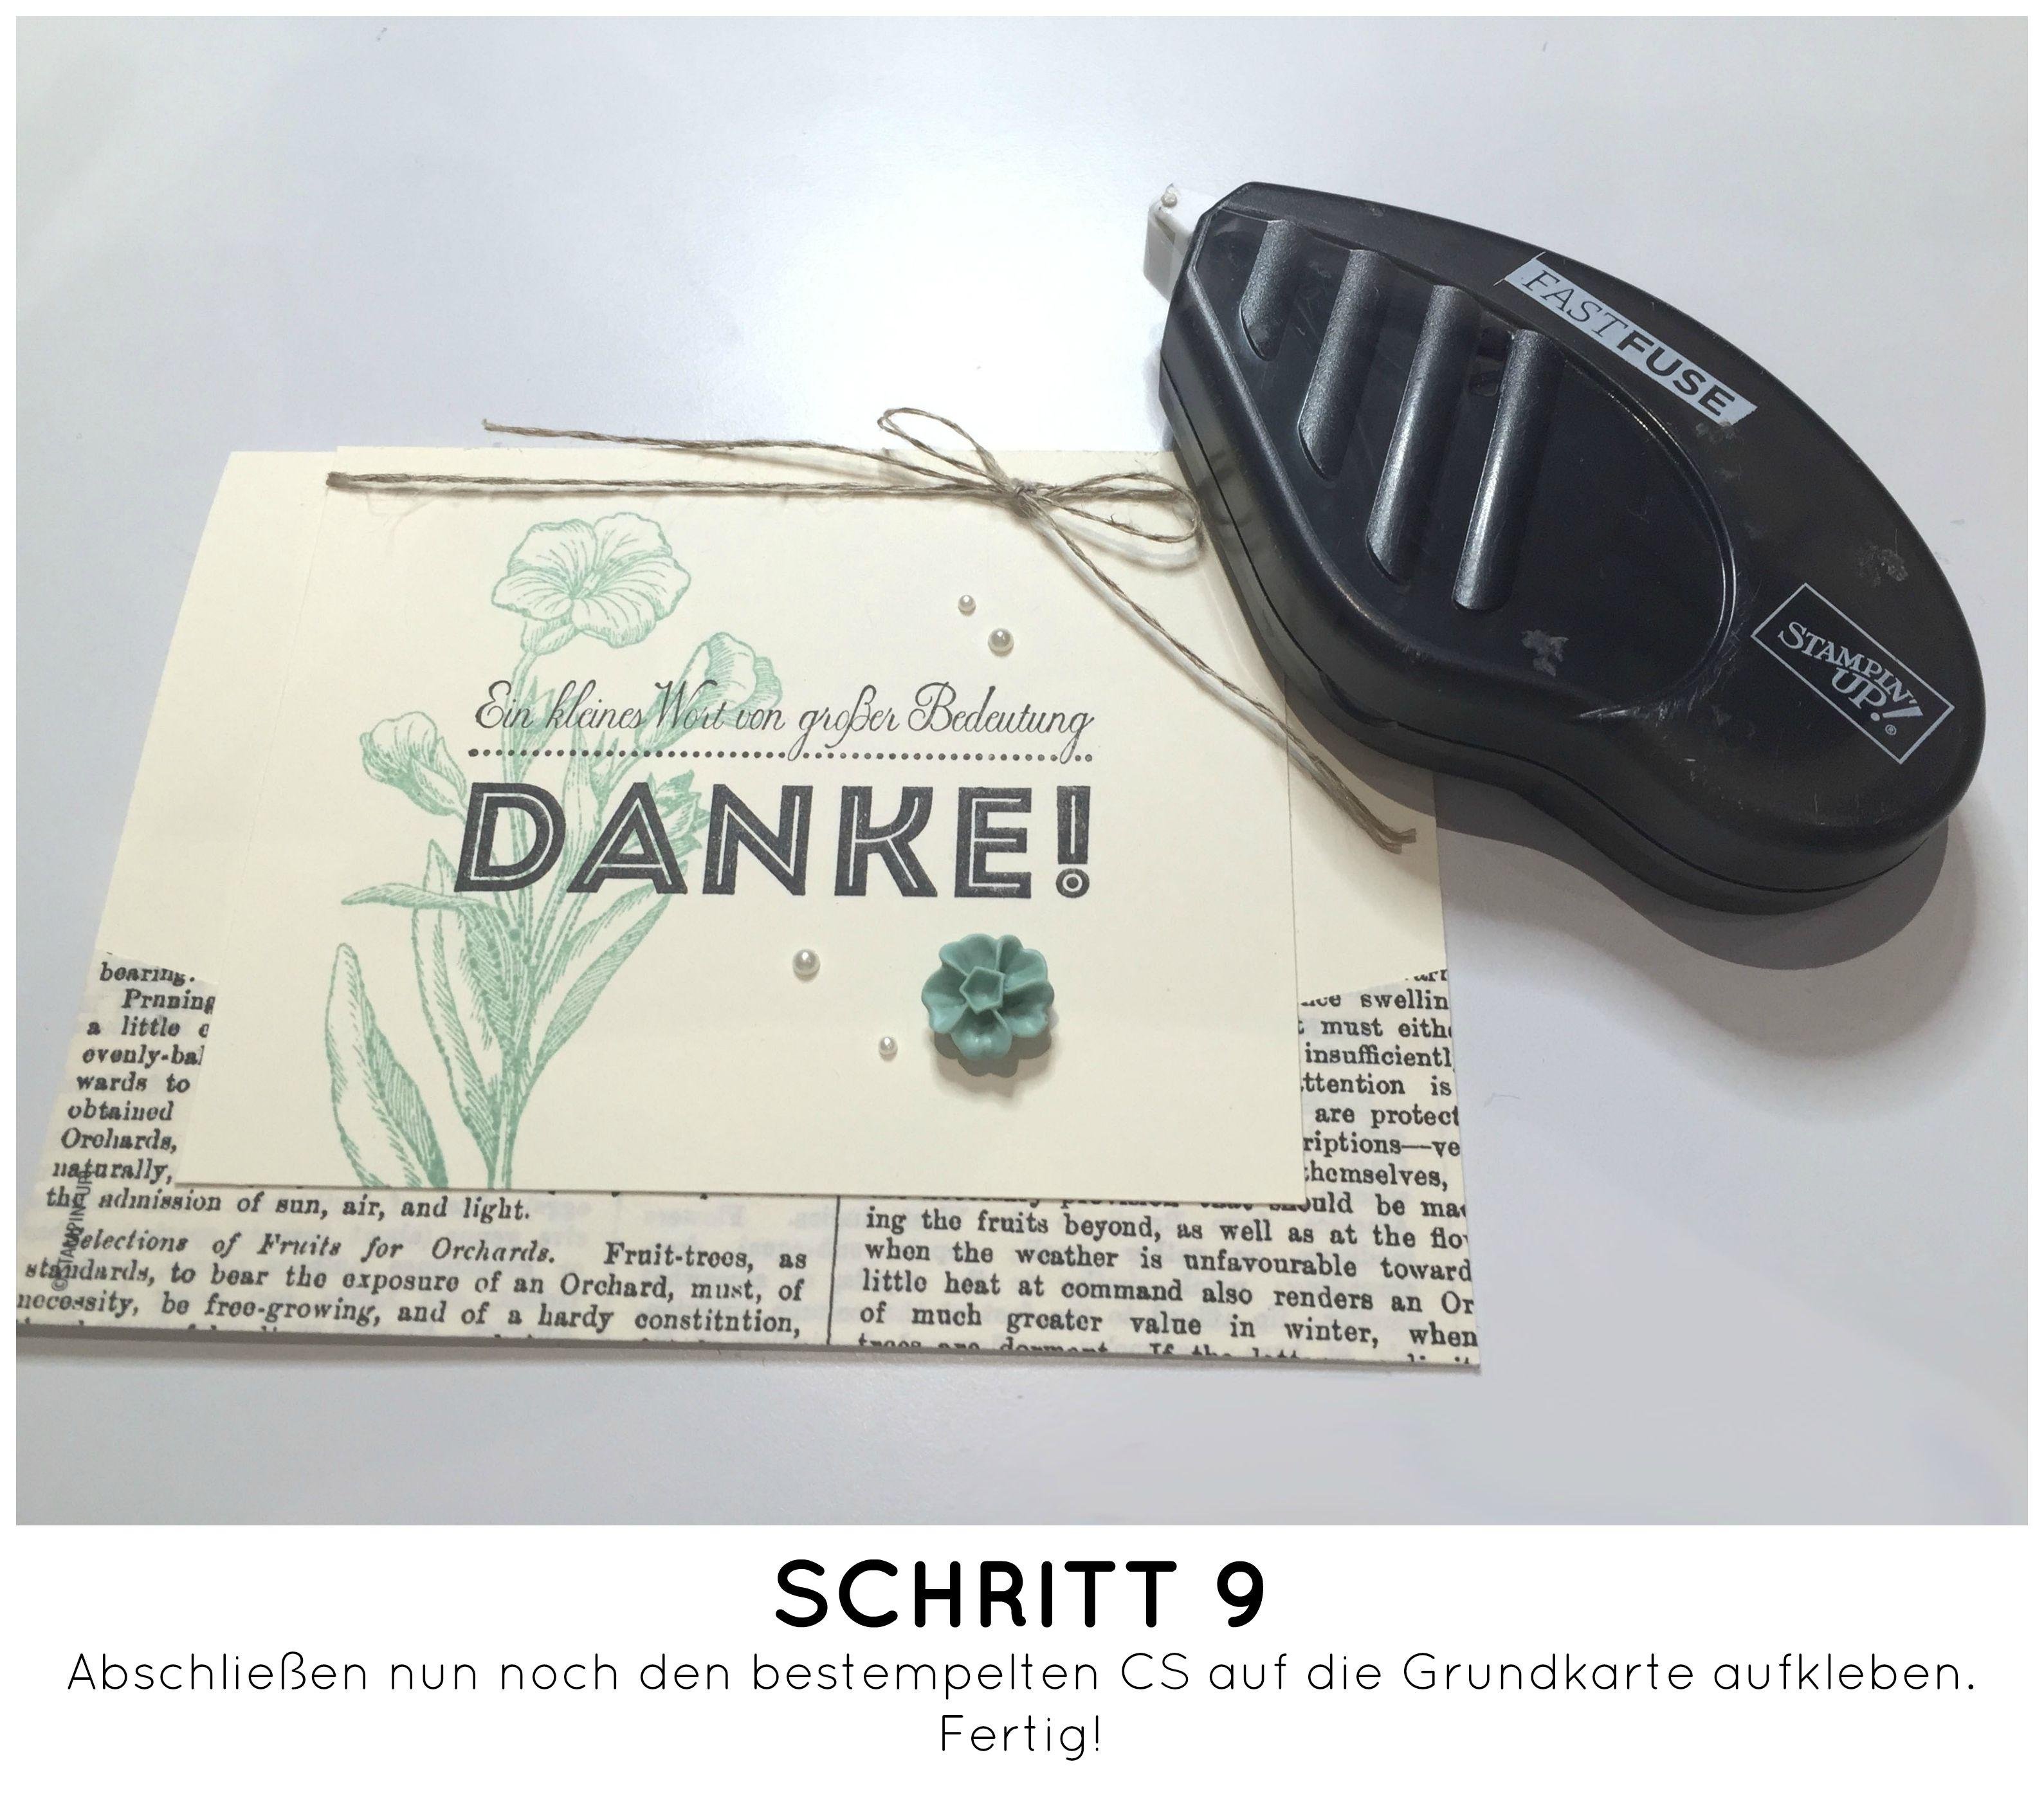 Stampin Up-Stempelherz-Dankeskarte-Zeig es am Montag Karte Danke Anleitung - Schritt 09